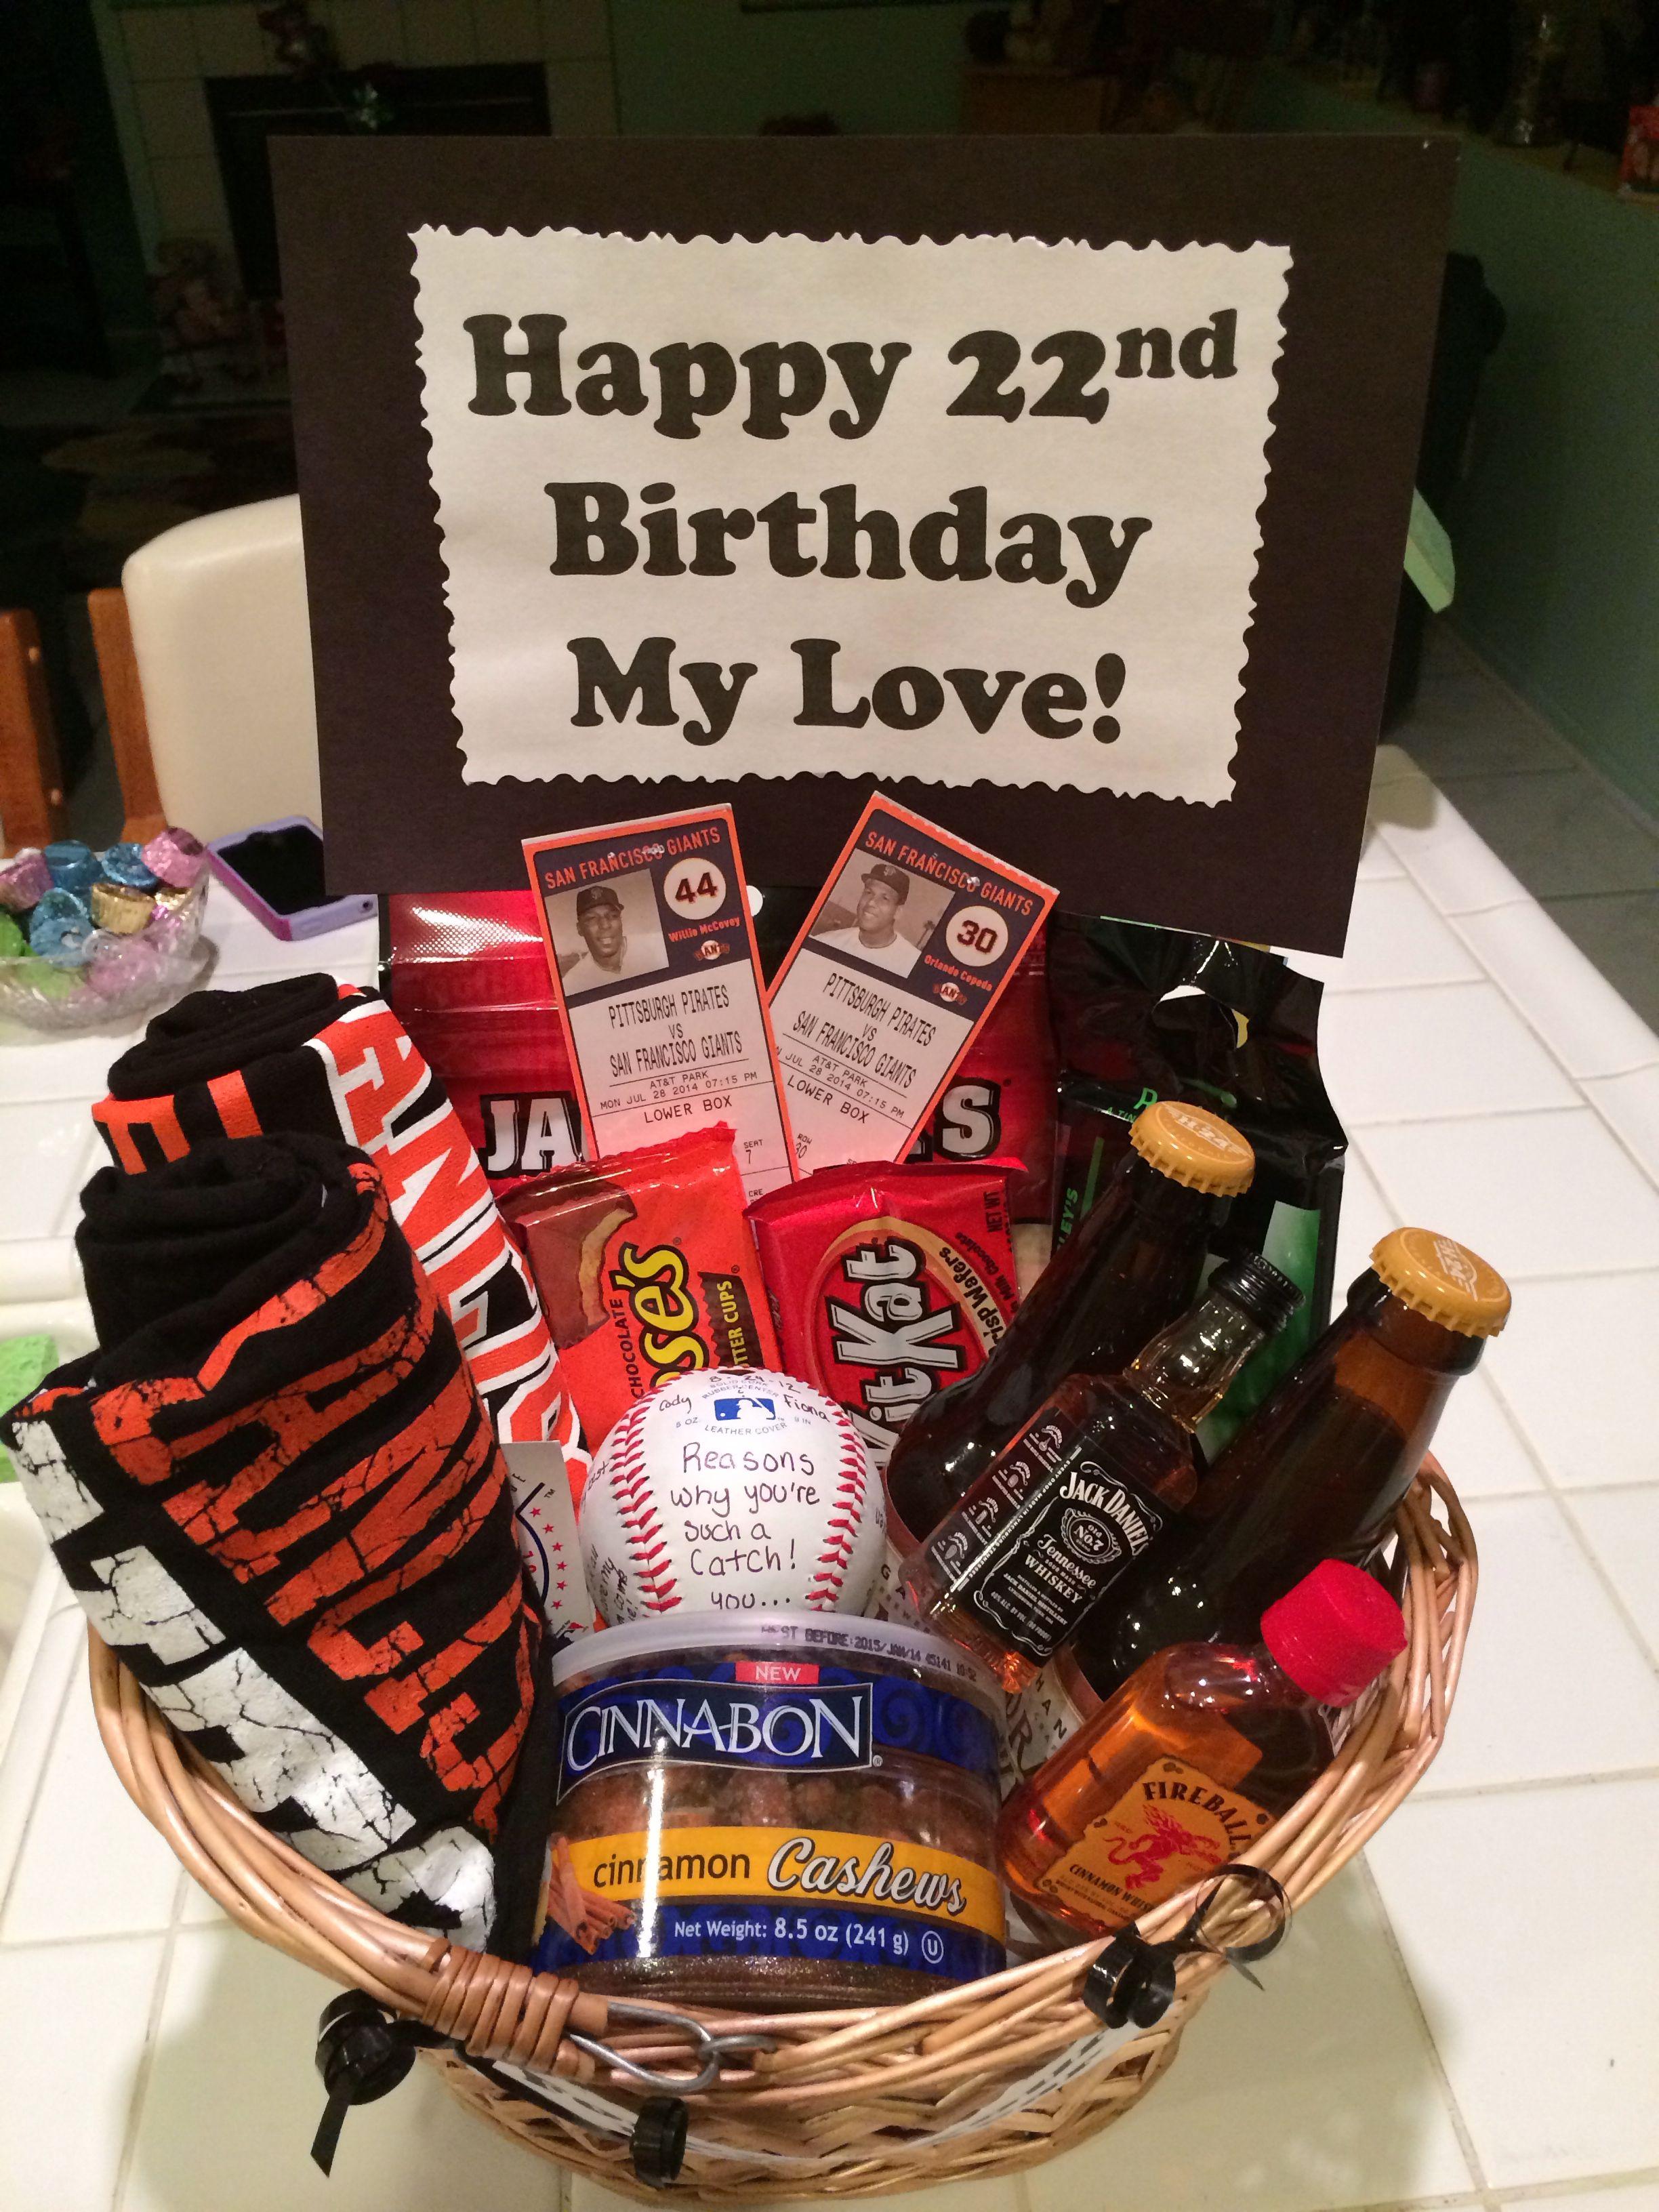 Sf Giants Baseball Gift Basket For My Boyfriend S Birthday